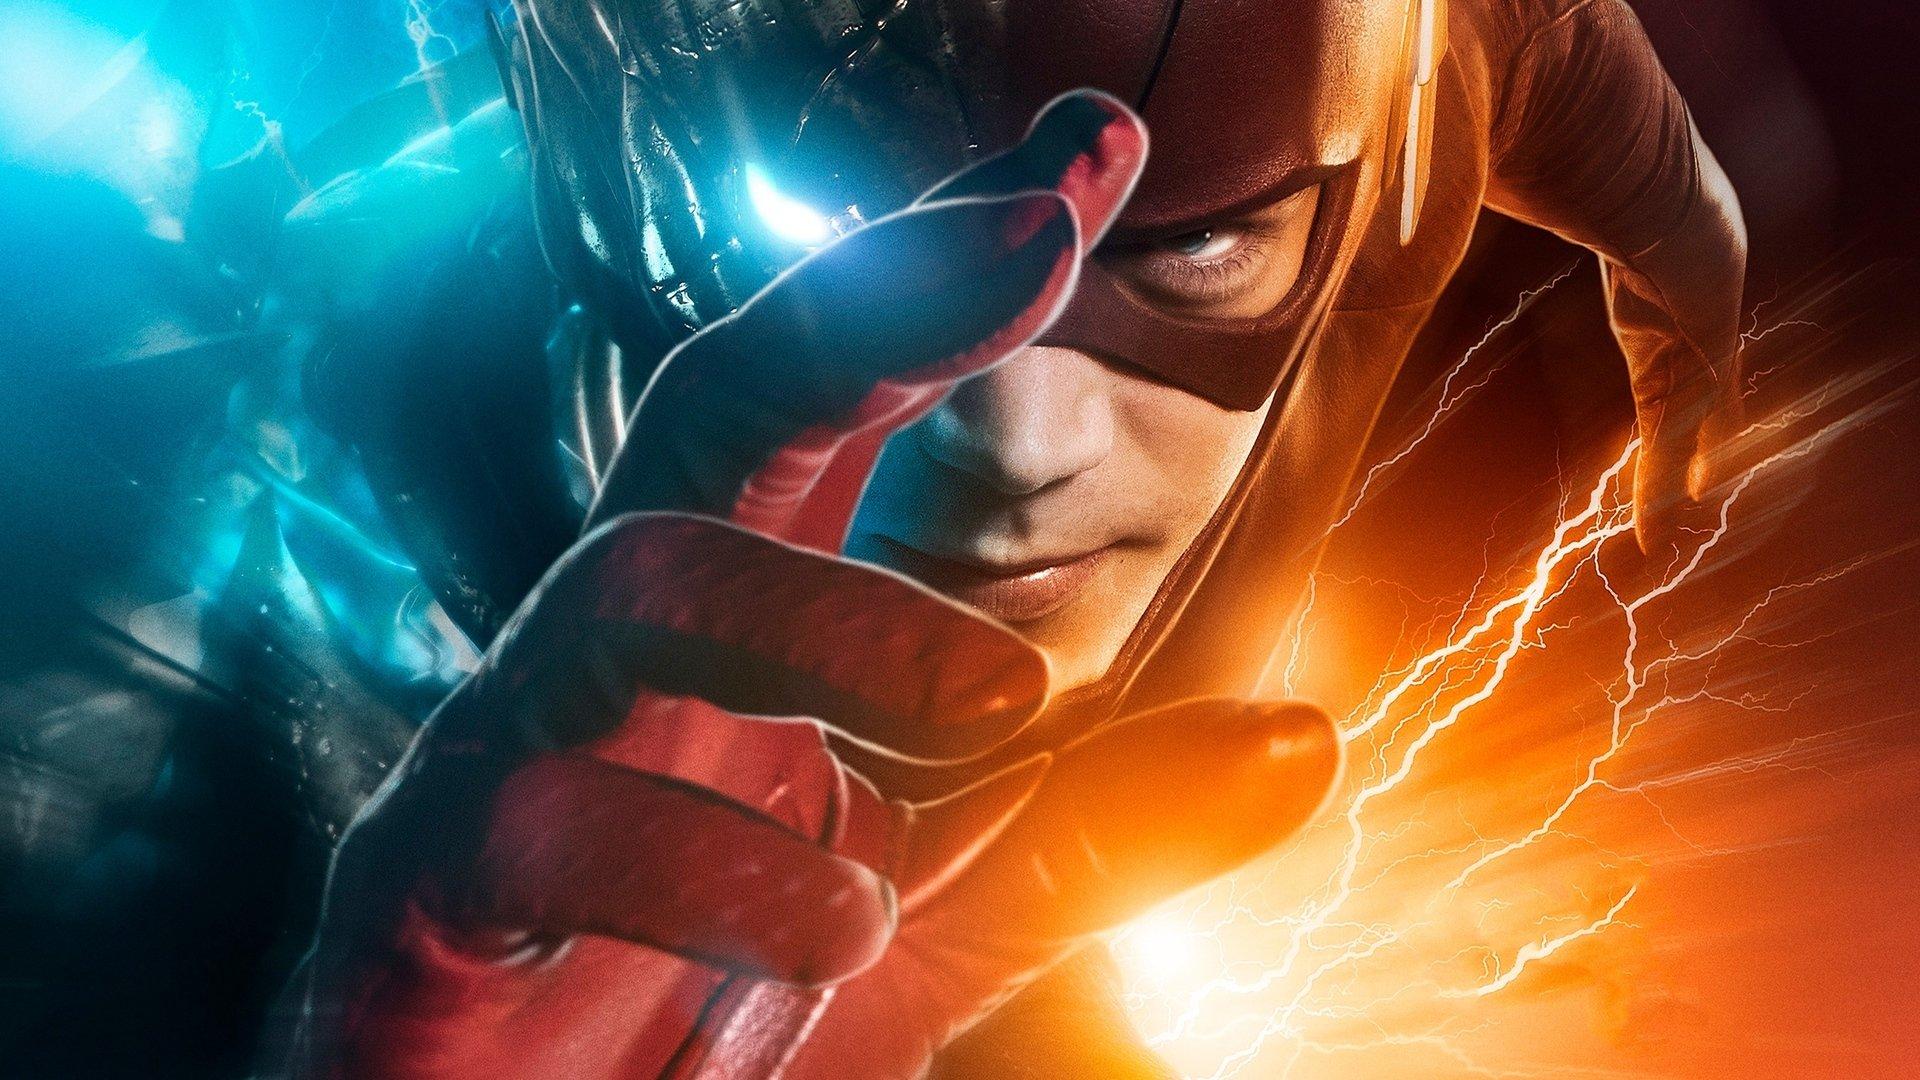 The Flash Hd Wallpaper